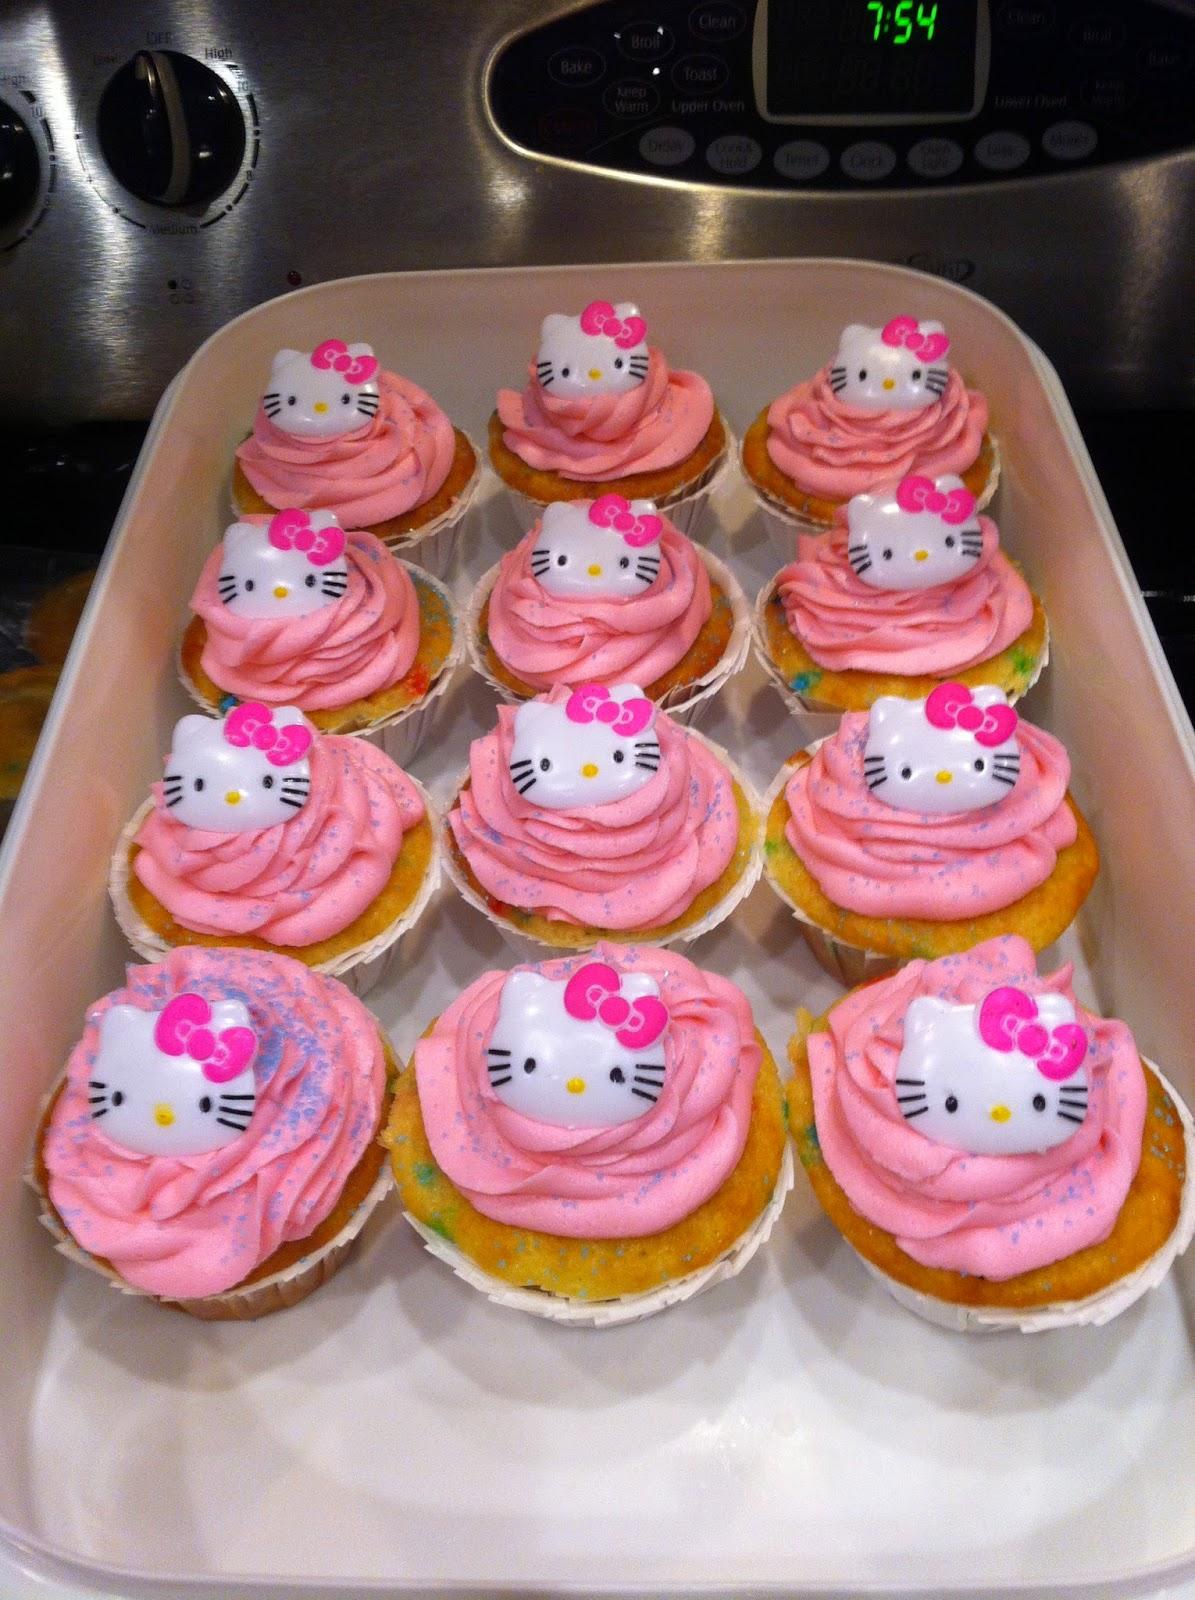 Share'n Da Sugar: Chloe's 8th Birthday! Hello Kitty!